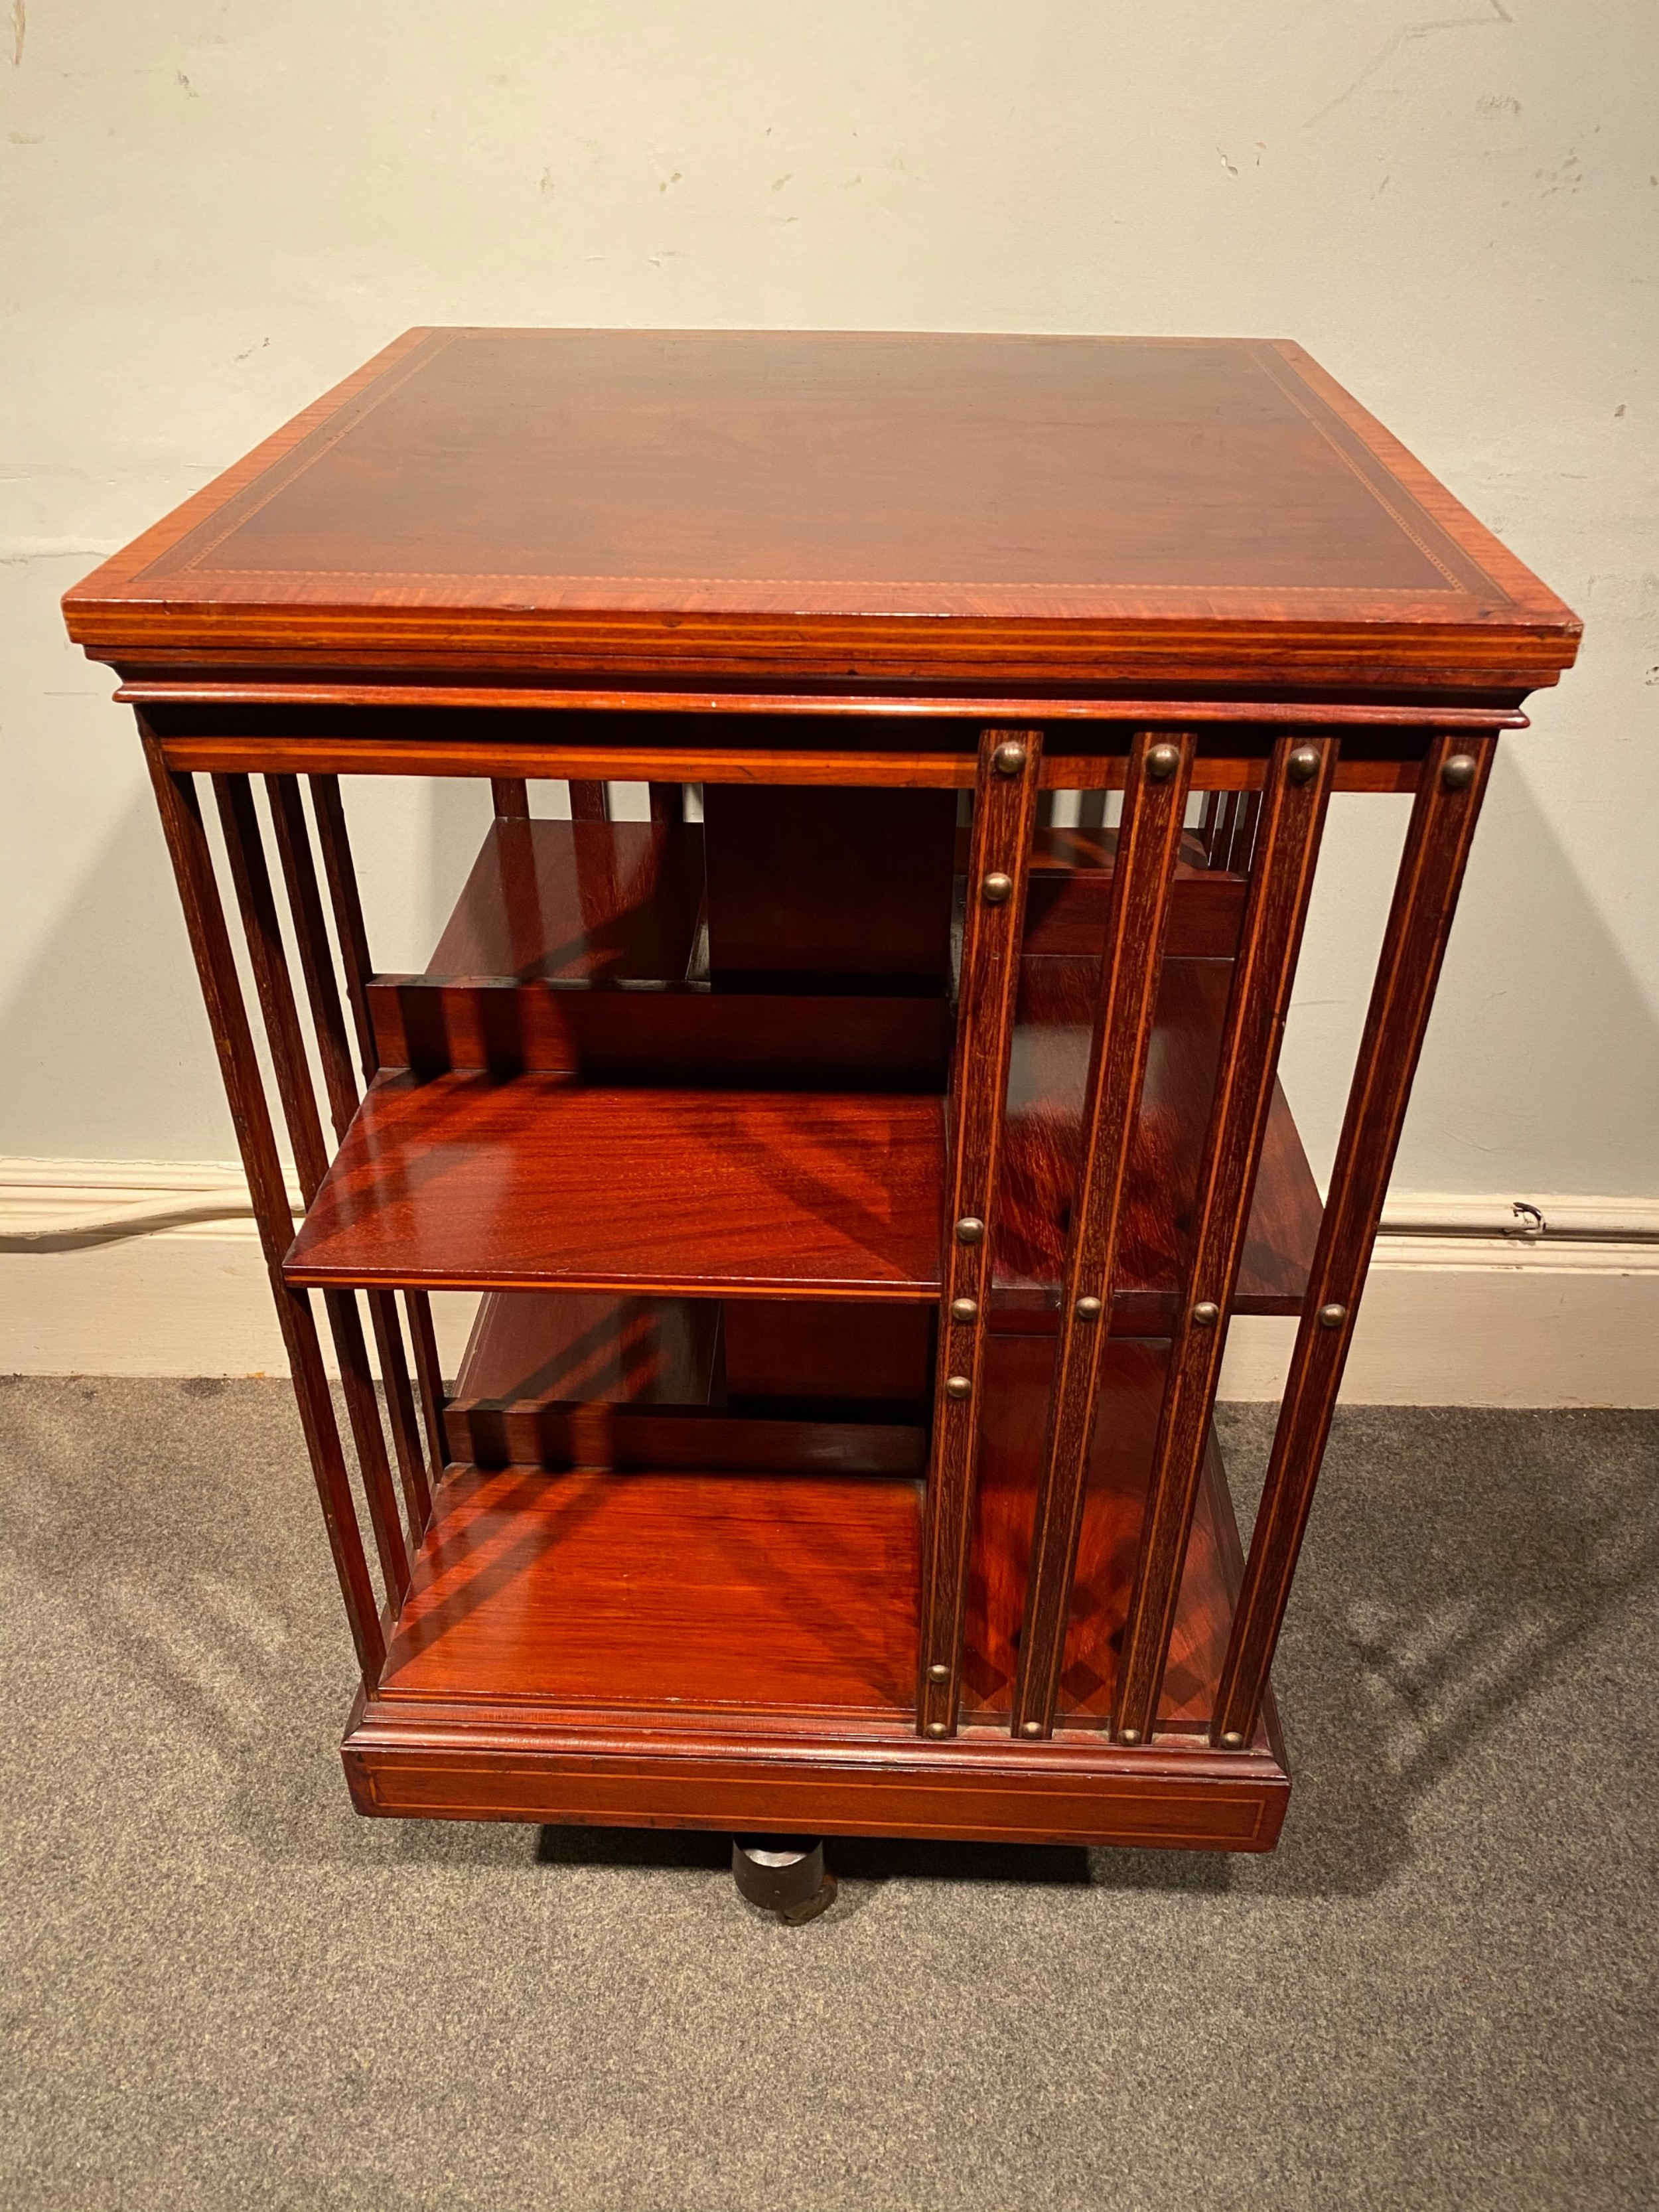 edwardian inlaid mahogany revolving bookcase by maples